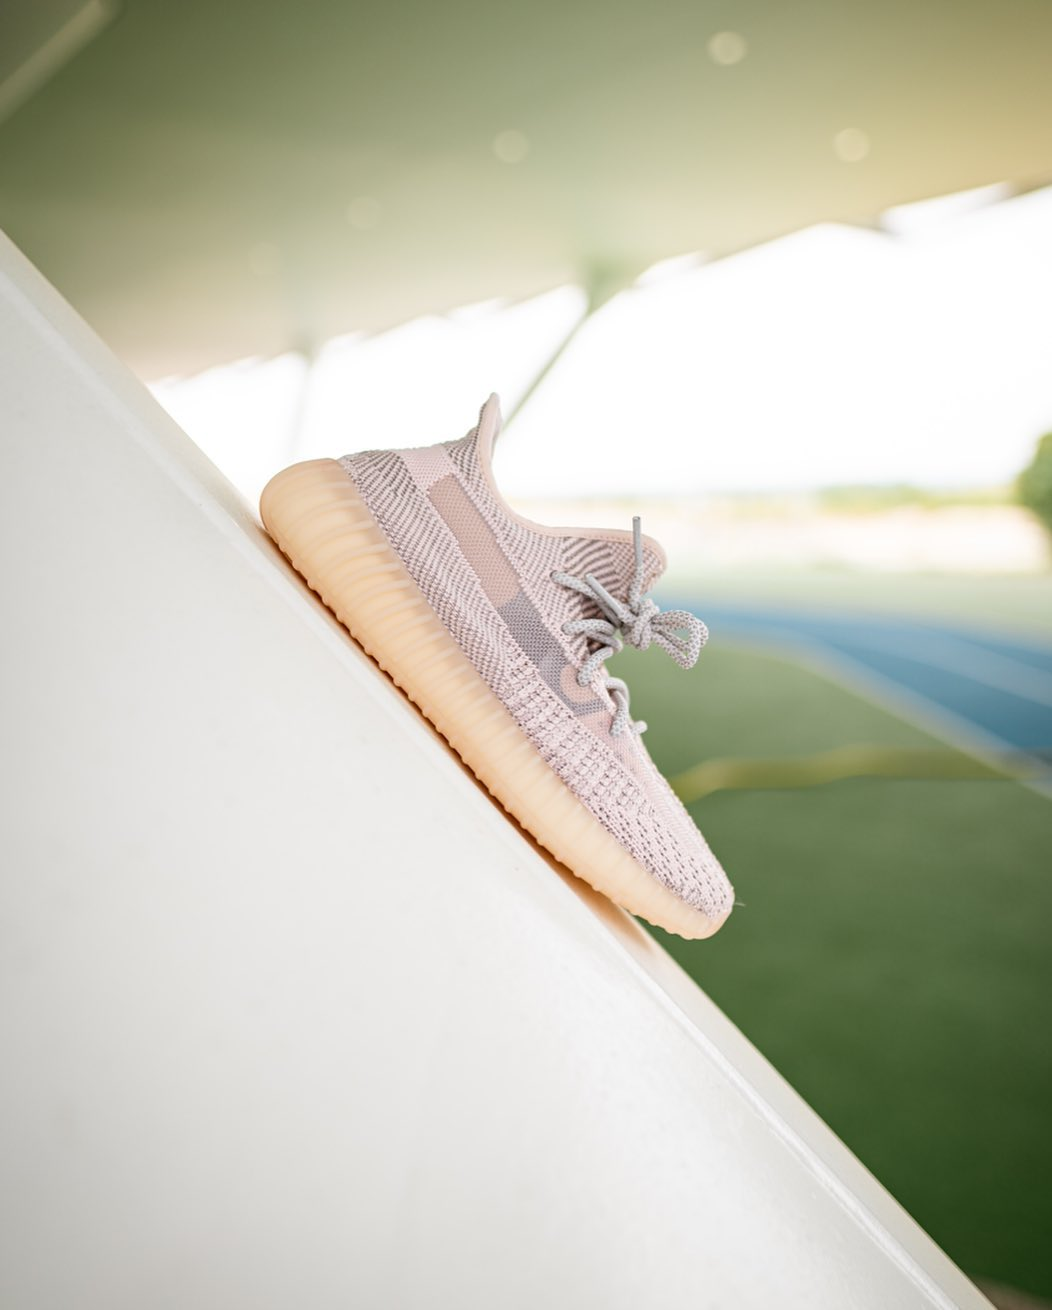 adidas,Yeezy 350,Yeezy Boost 3  人傻了!倒闭 Yeezy 350 全起飞!纯白破 5K!后悔没早买!